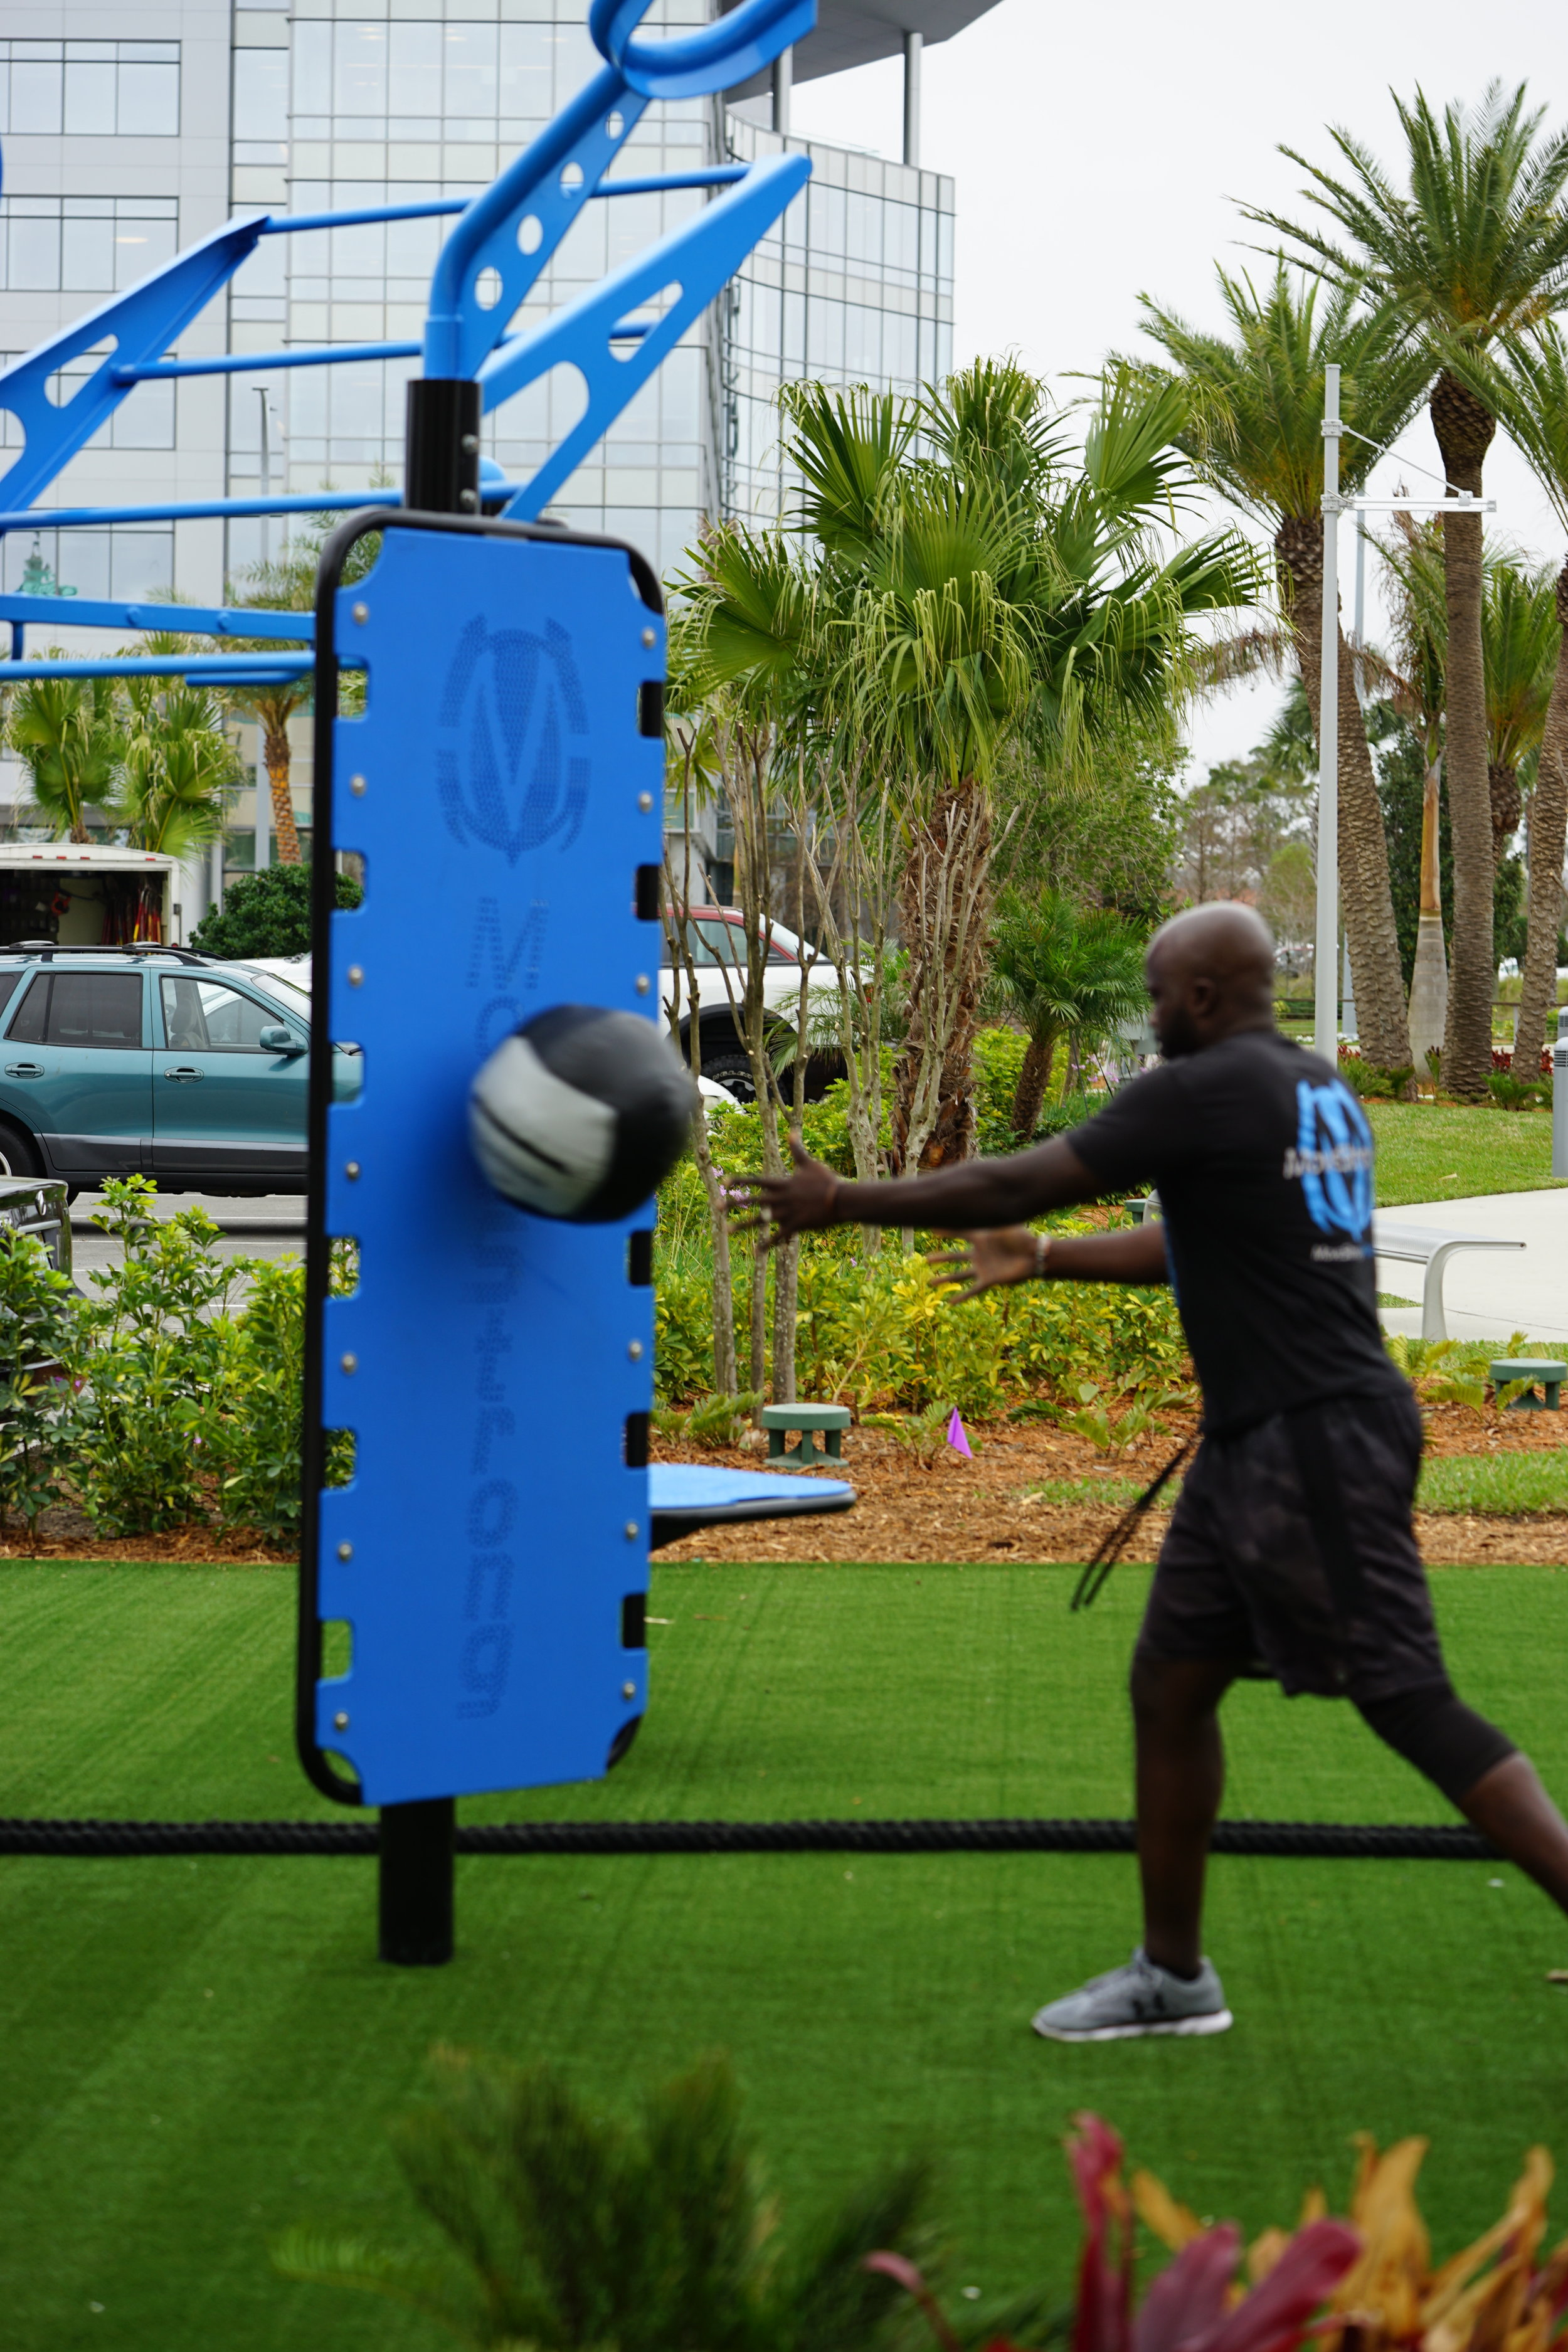 Medidince Ball throws